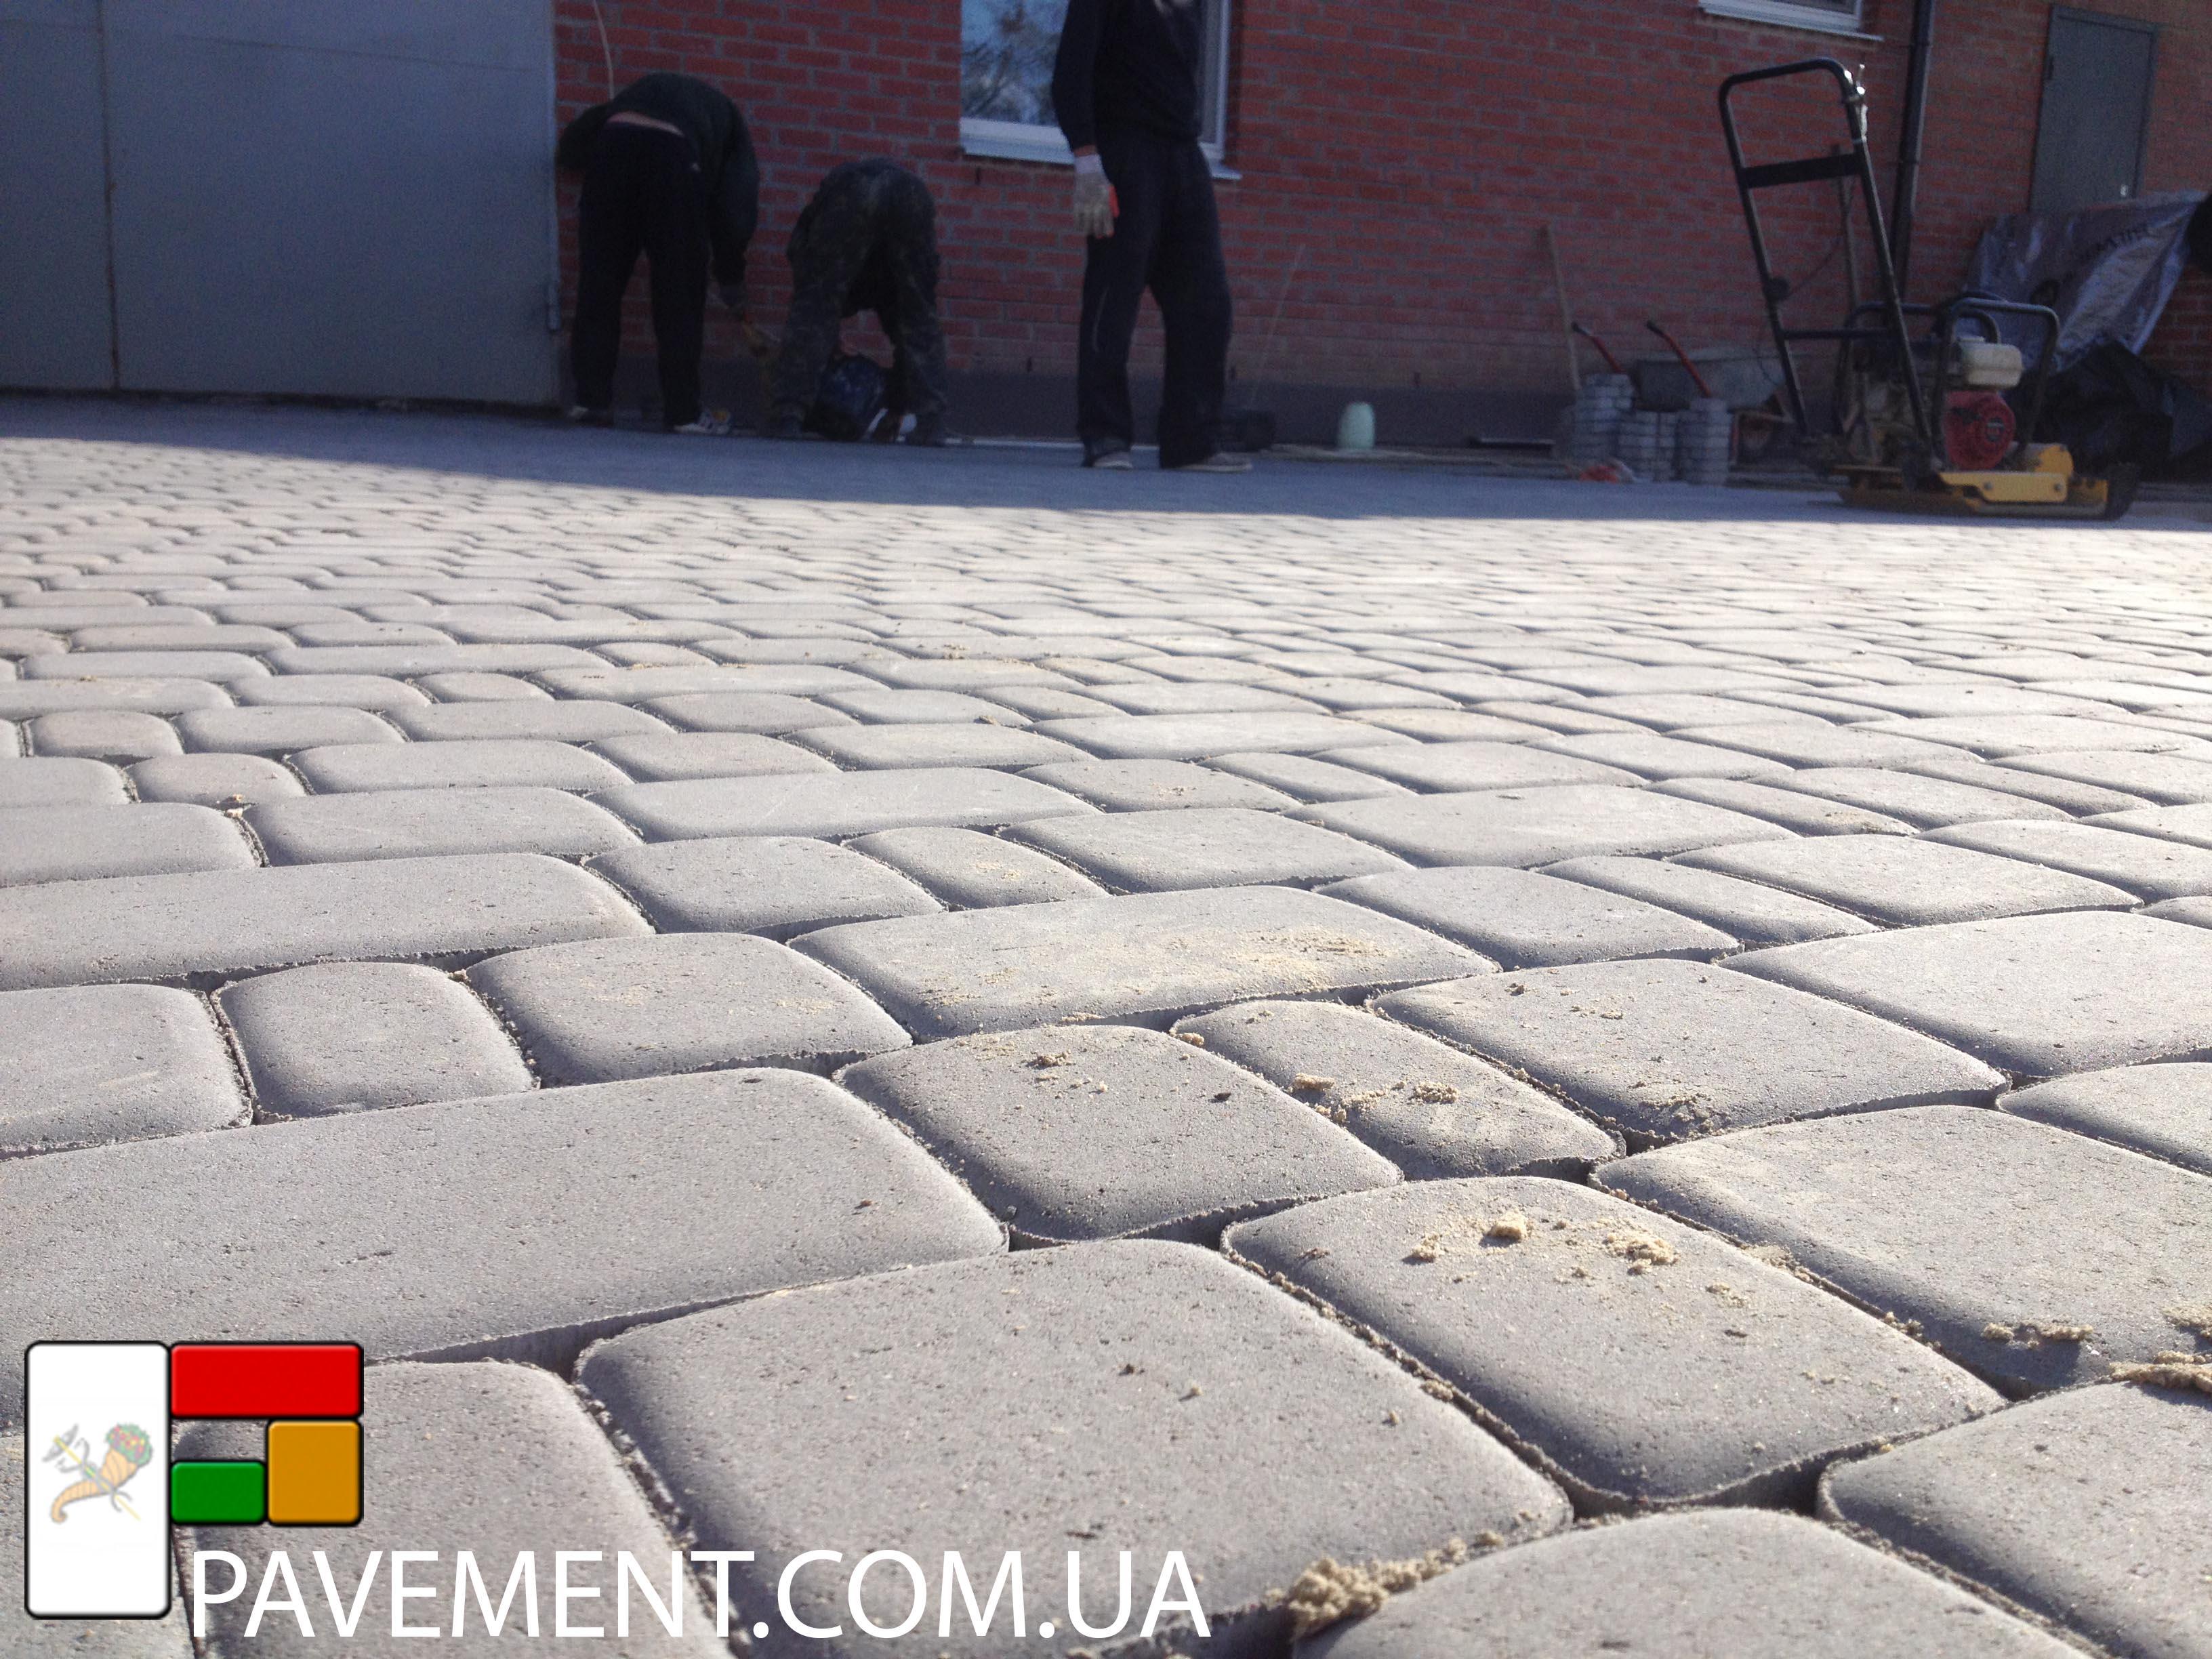 Укладка тротуарной плитки на даче на песок